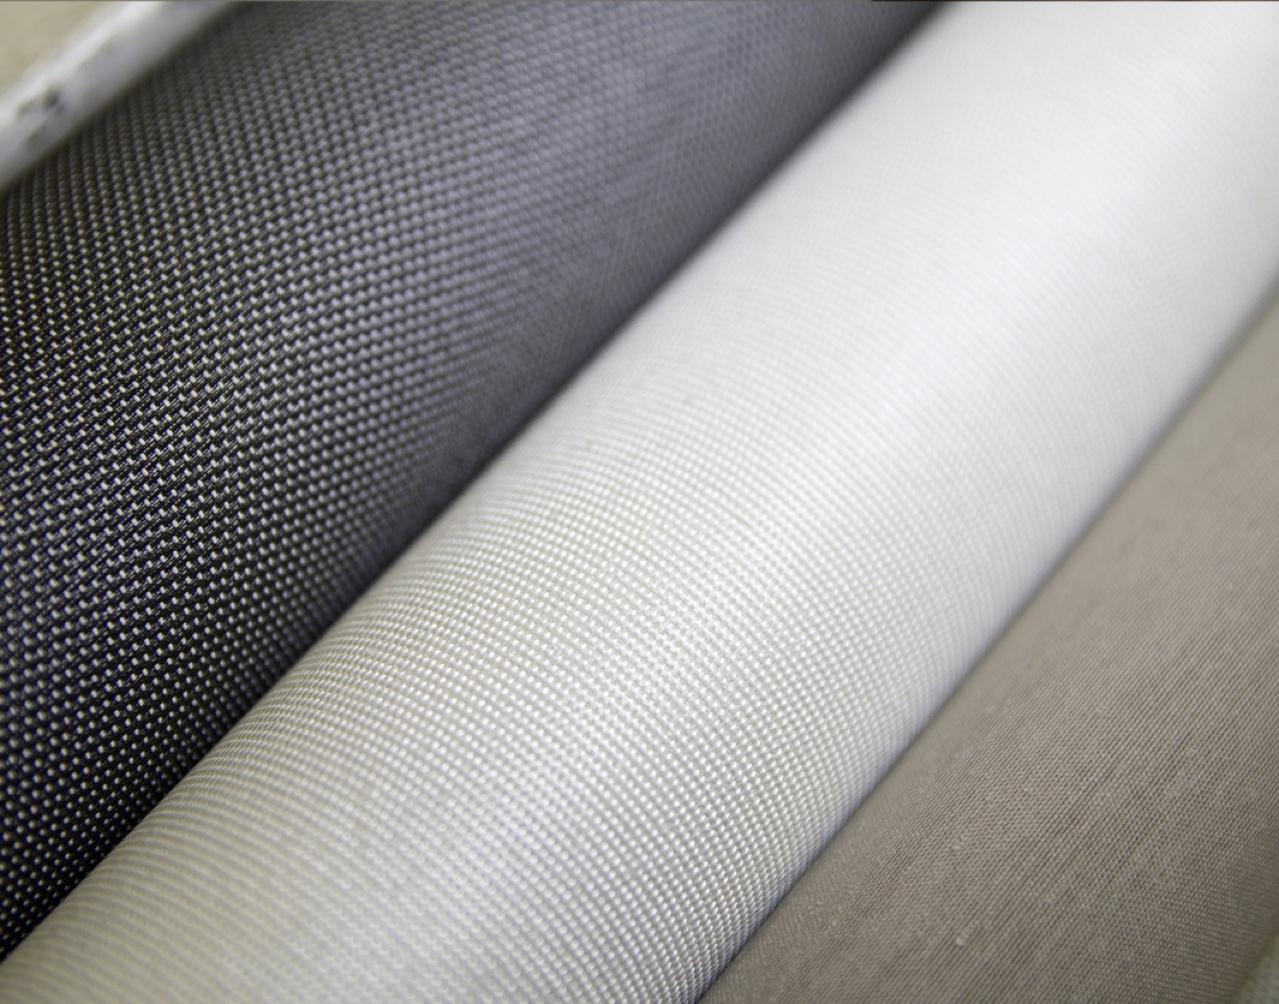 Shading Fabric Samples